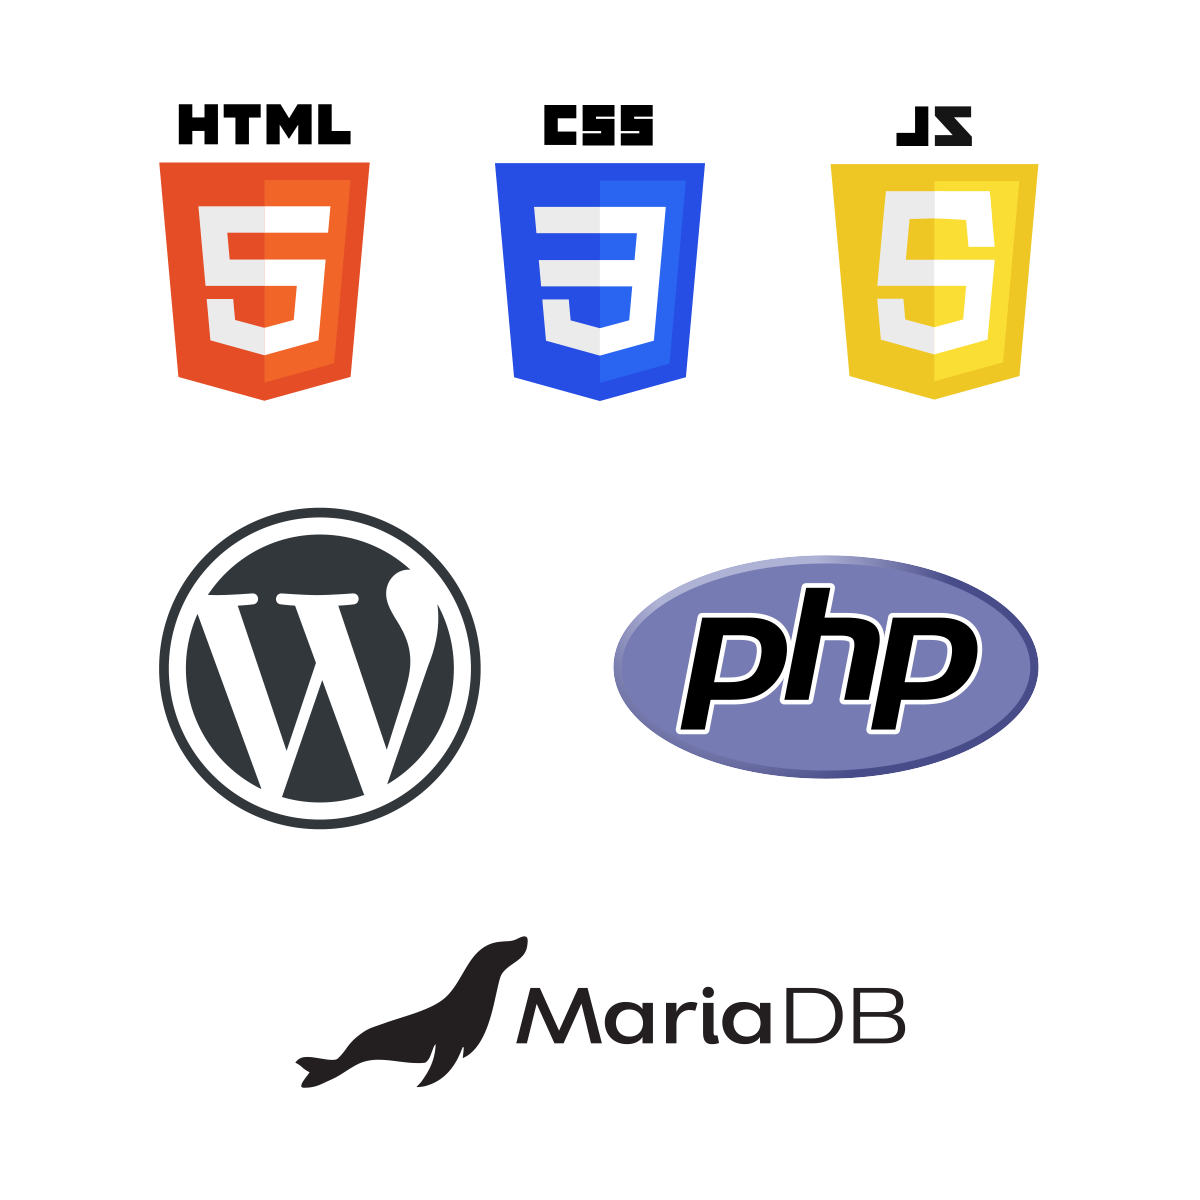 WordPress developer technology stack